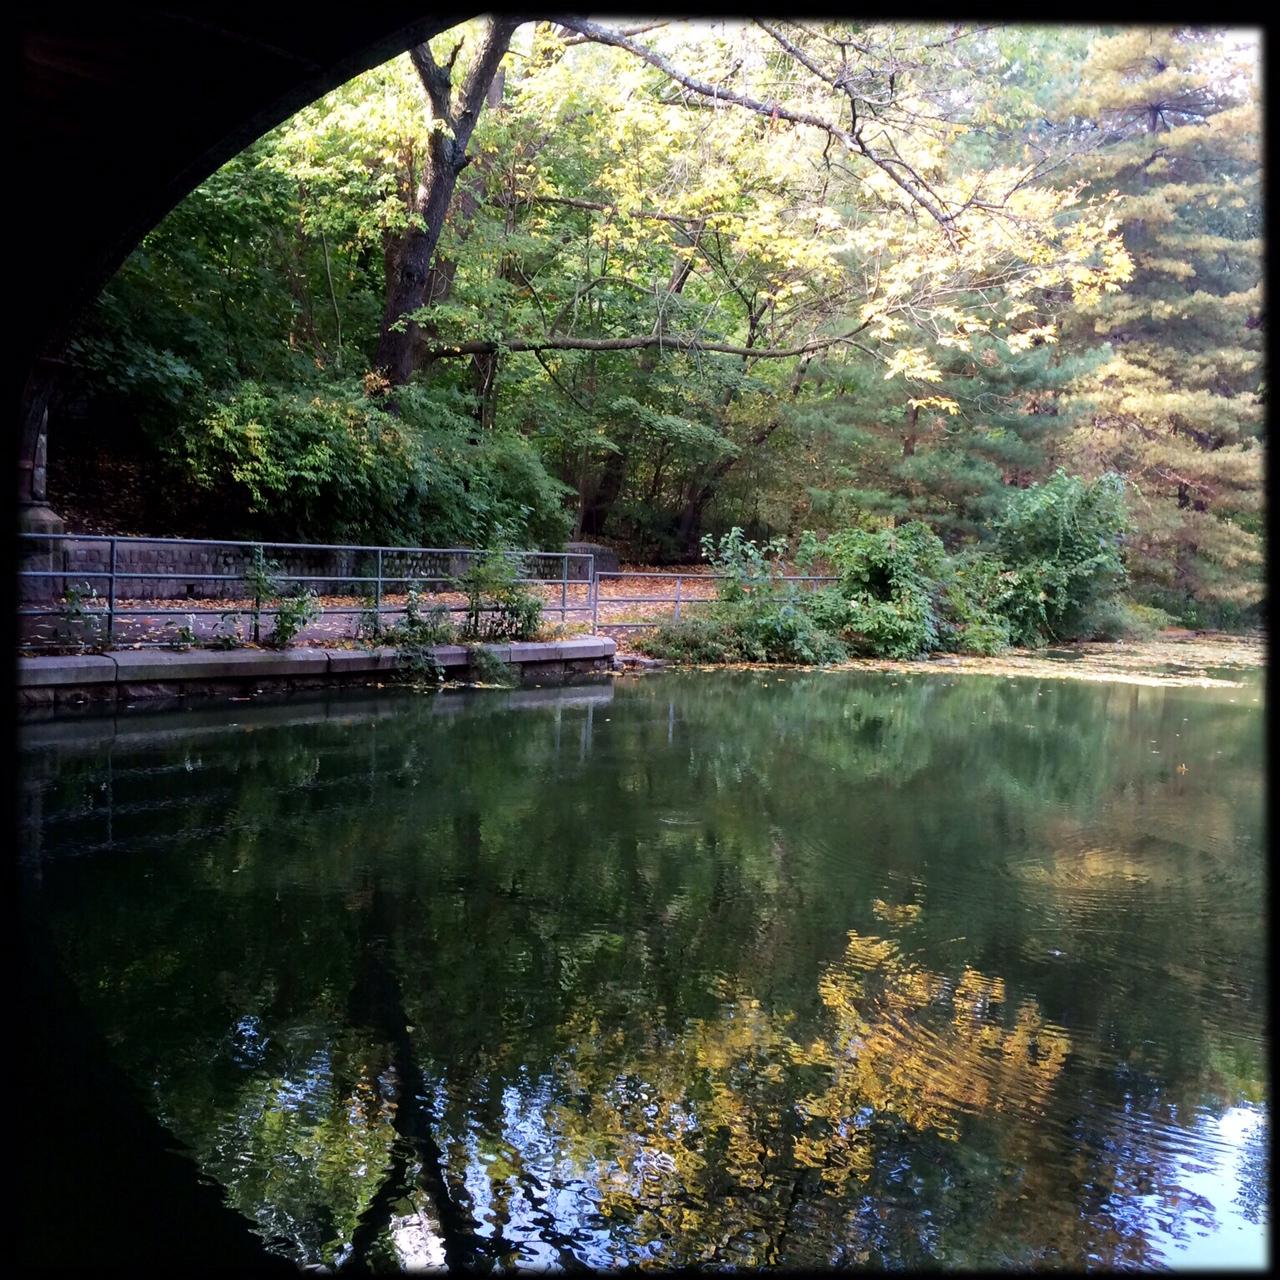 Under an Arch, Prospect Park